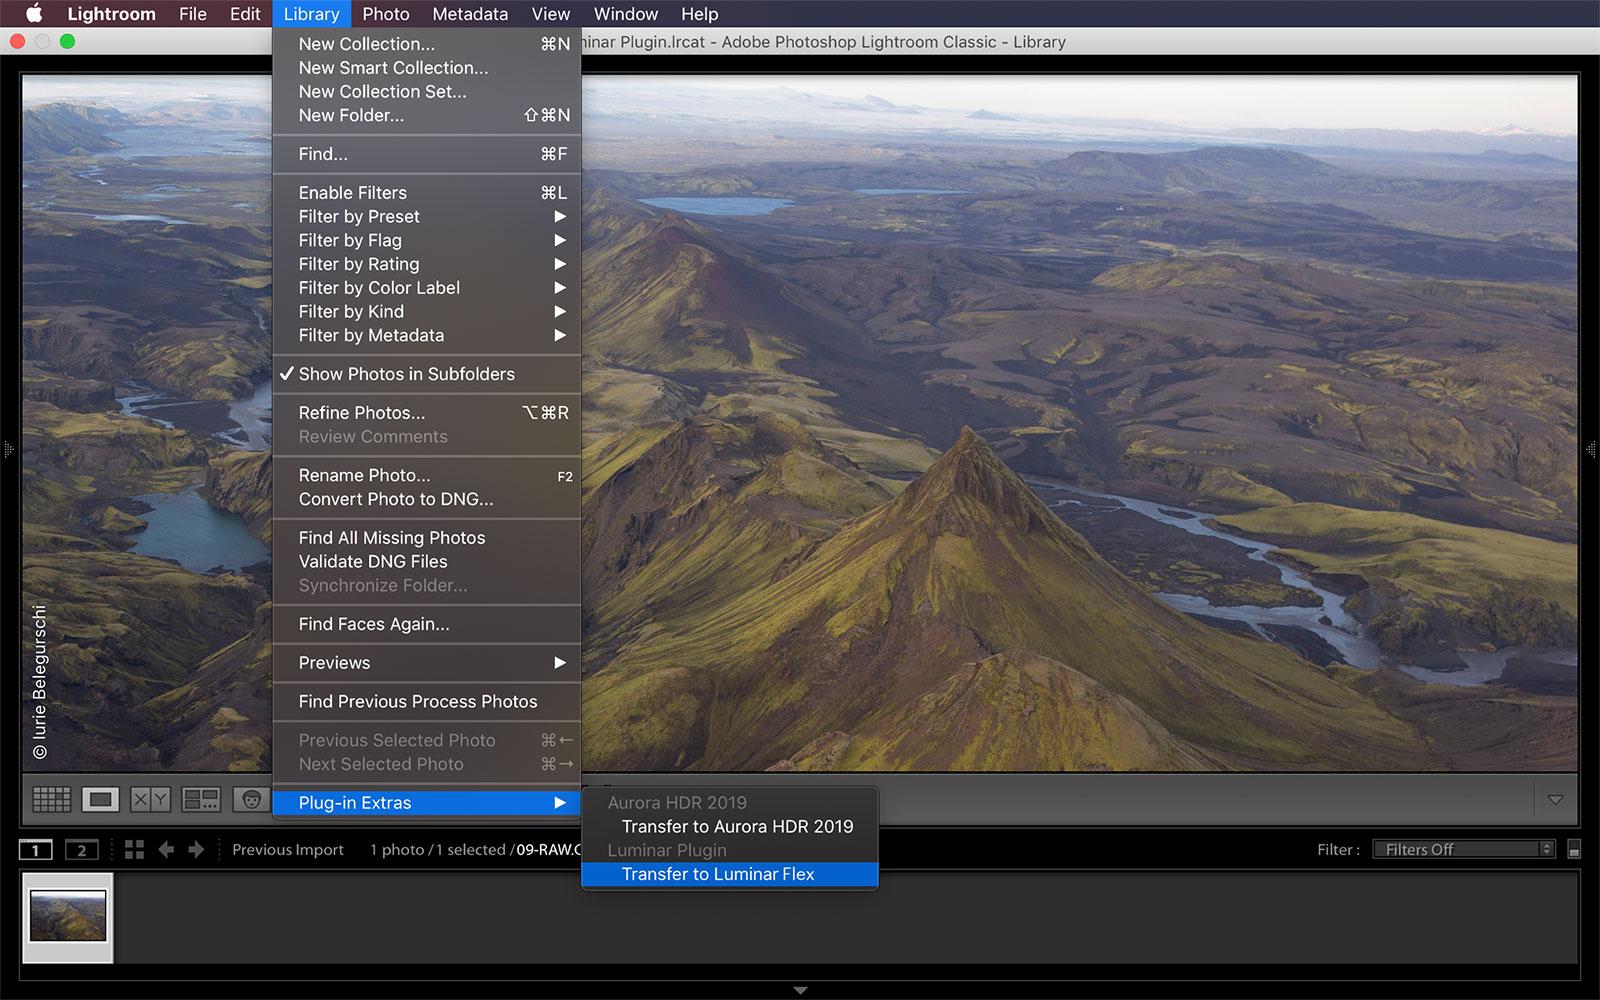 download luminar flex plugin